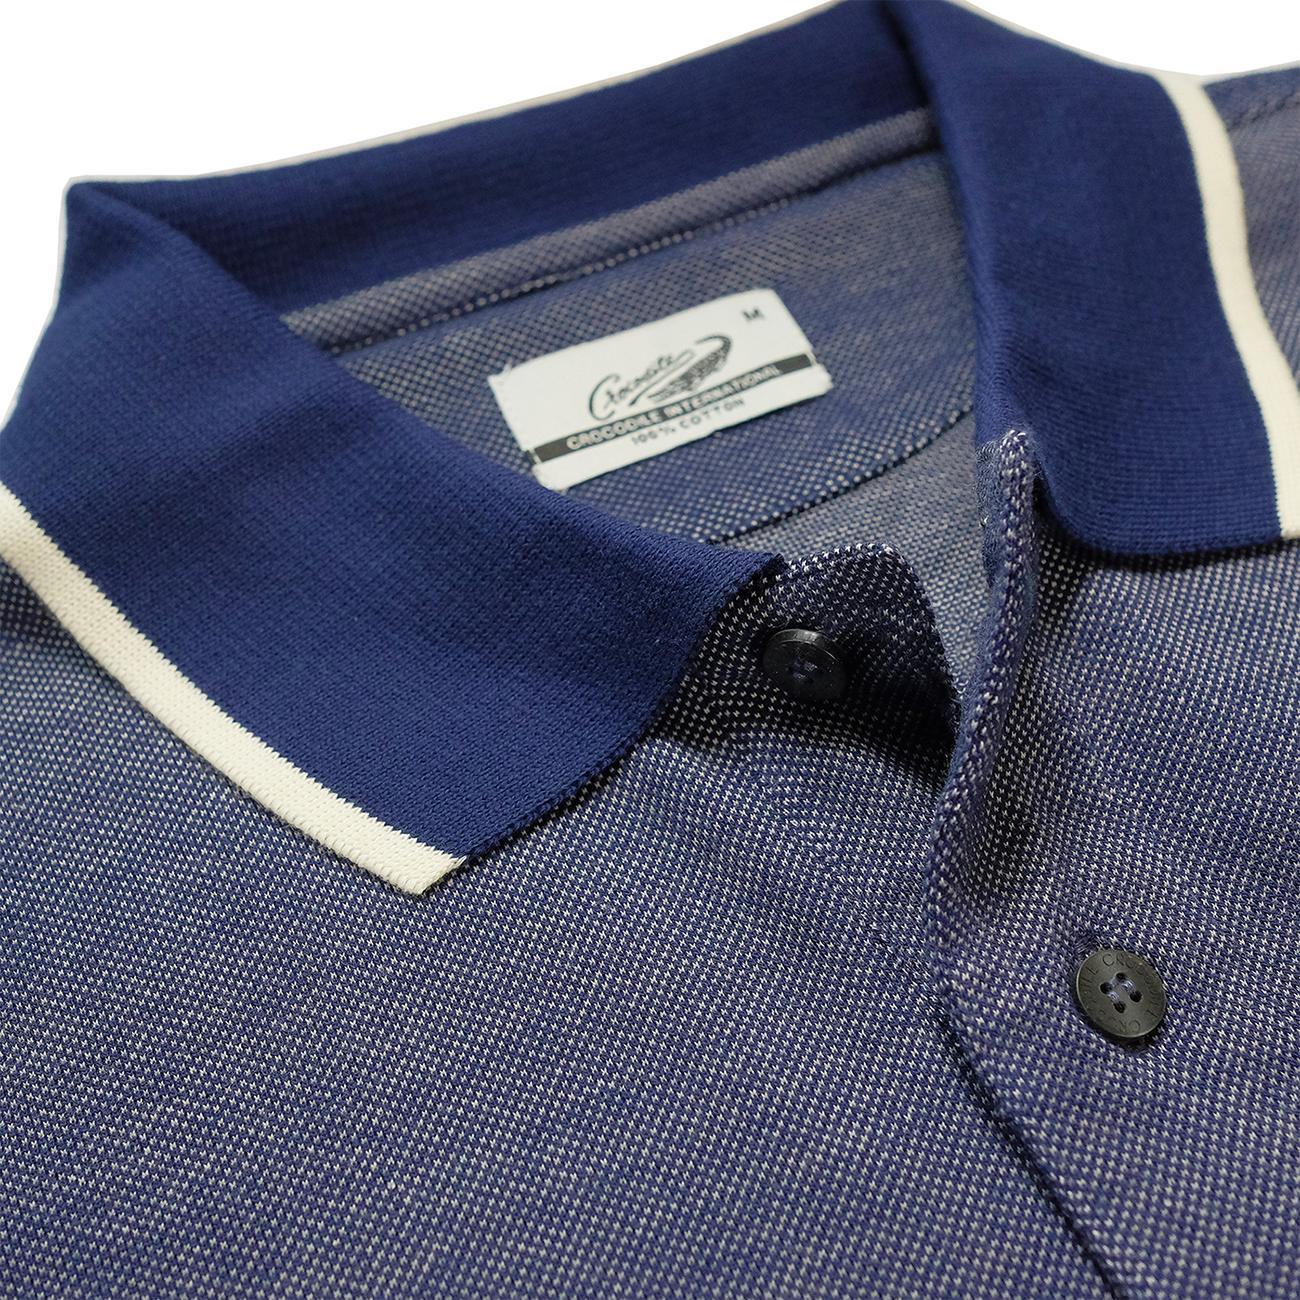 Fitur Code Royal Baju Pria Crocodile Men Polo Shirt Slim Fit Bahan Clas Ori Katun Dark Navy S